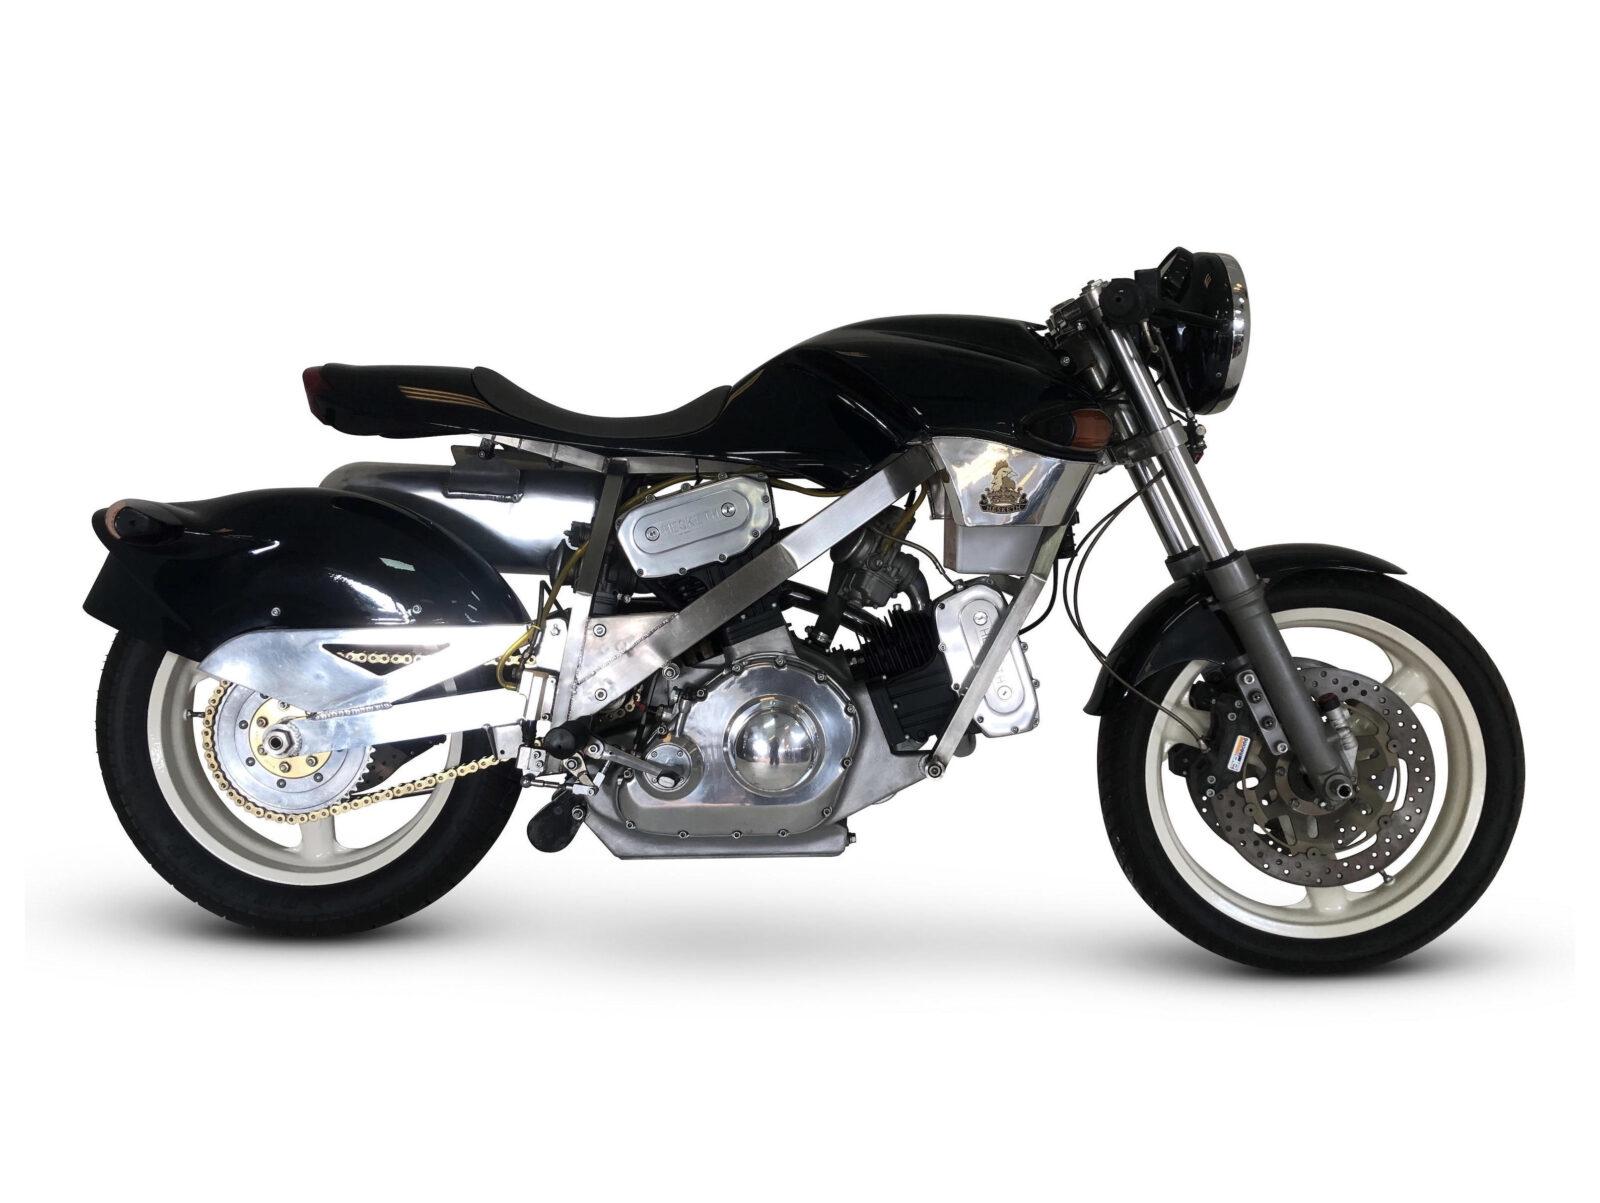 Hesketh Vortan Prototype Motorcycle